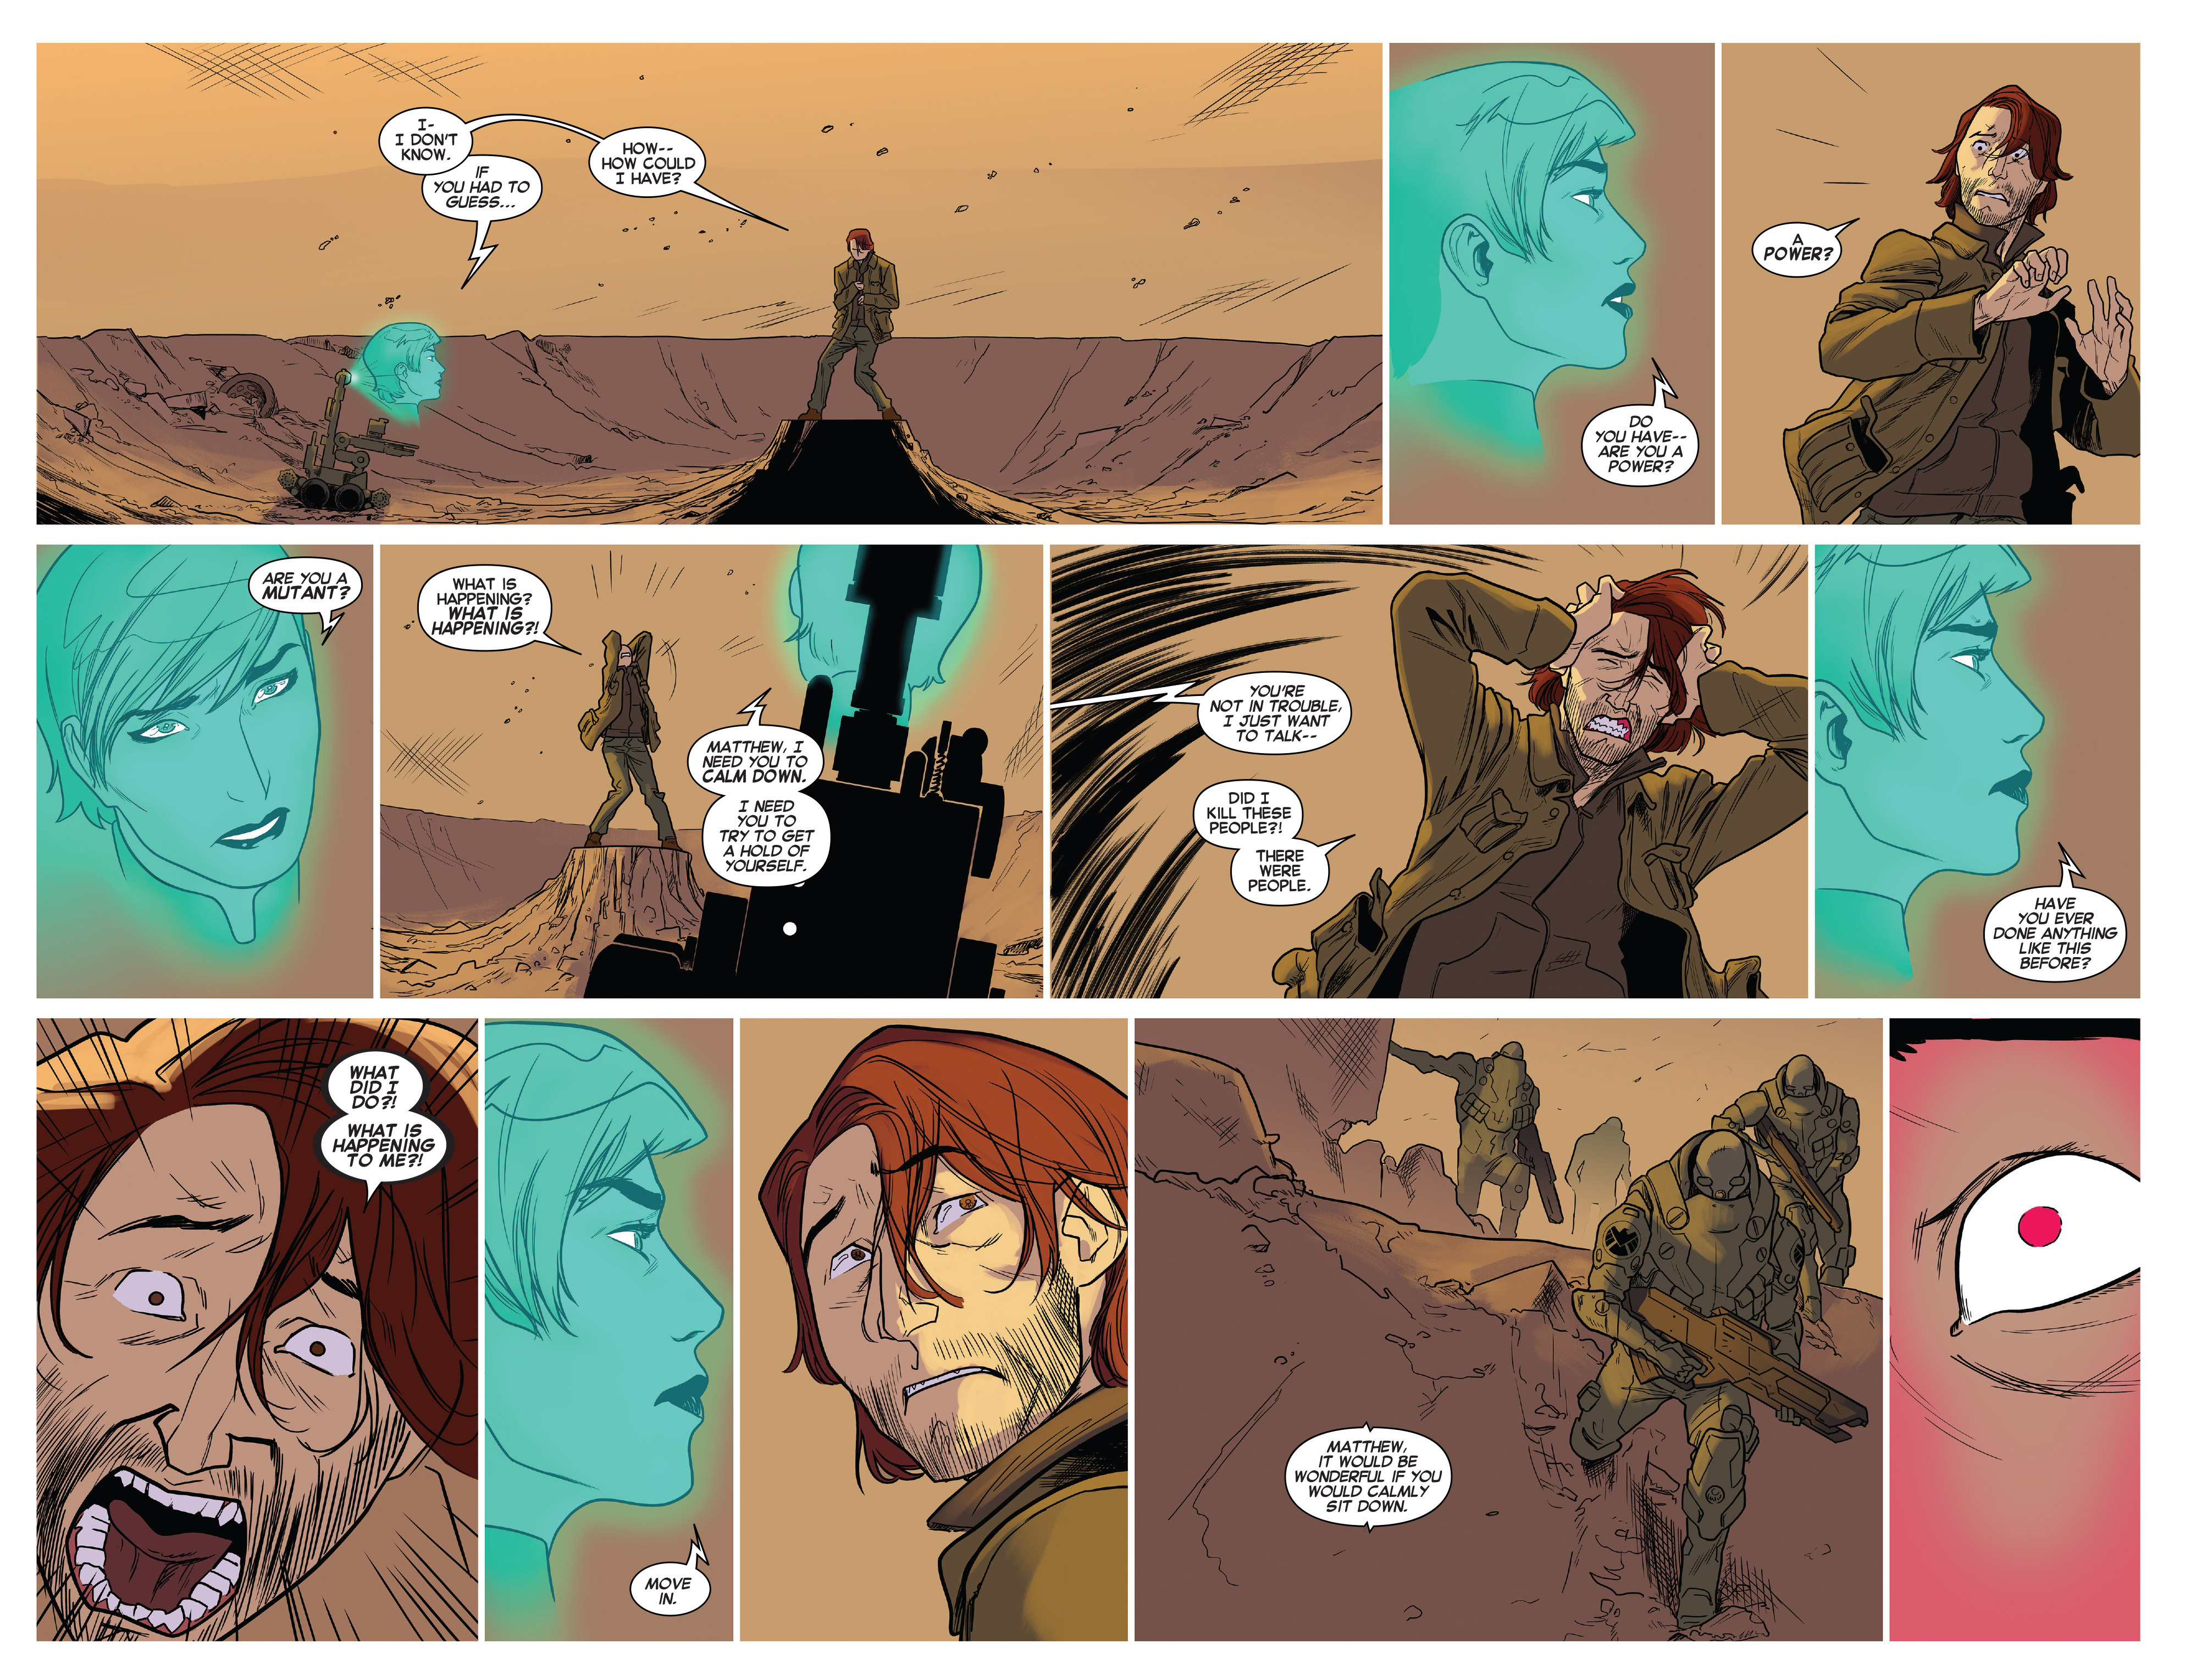 Read online Uncanny X-Men (2013) comic -  Issue # _TPB 4 - vs. S.H.I.E.L.D - 110